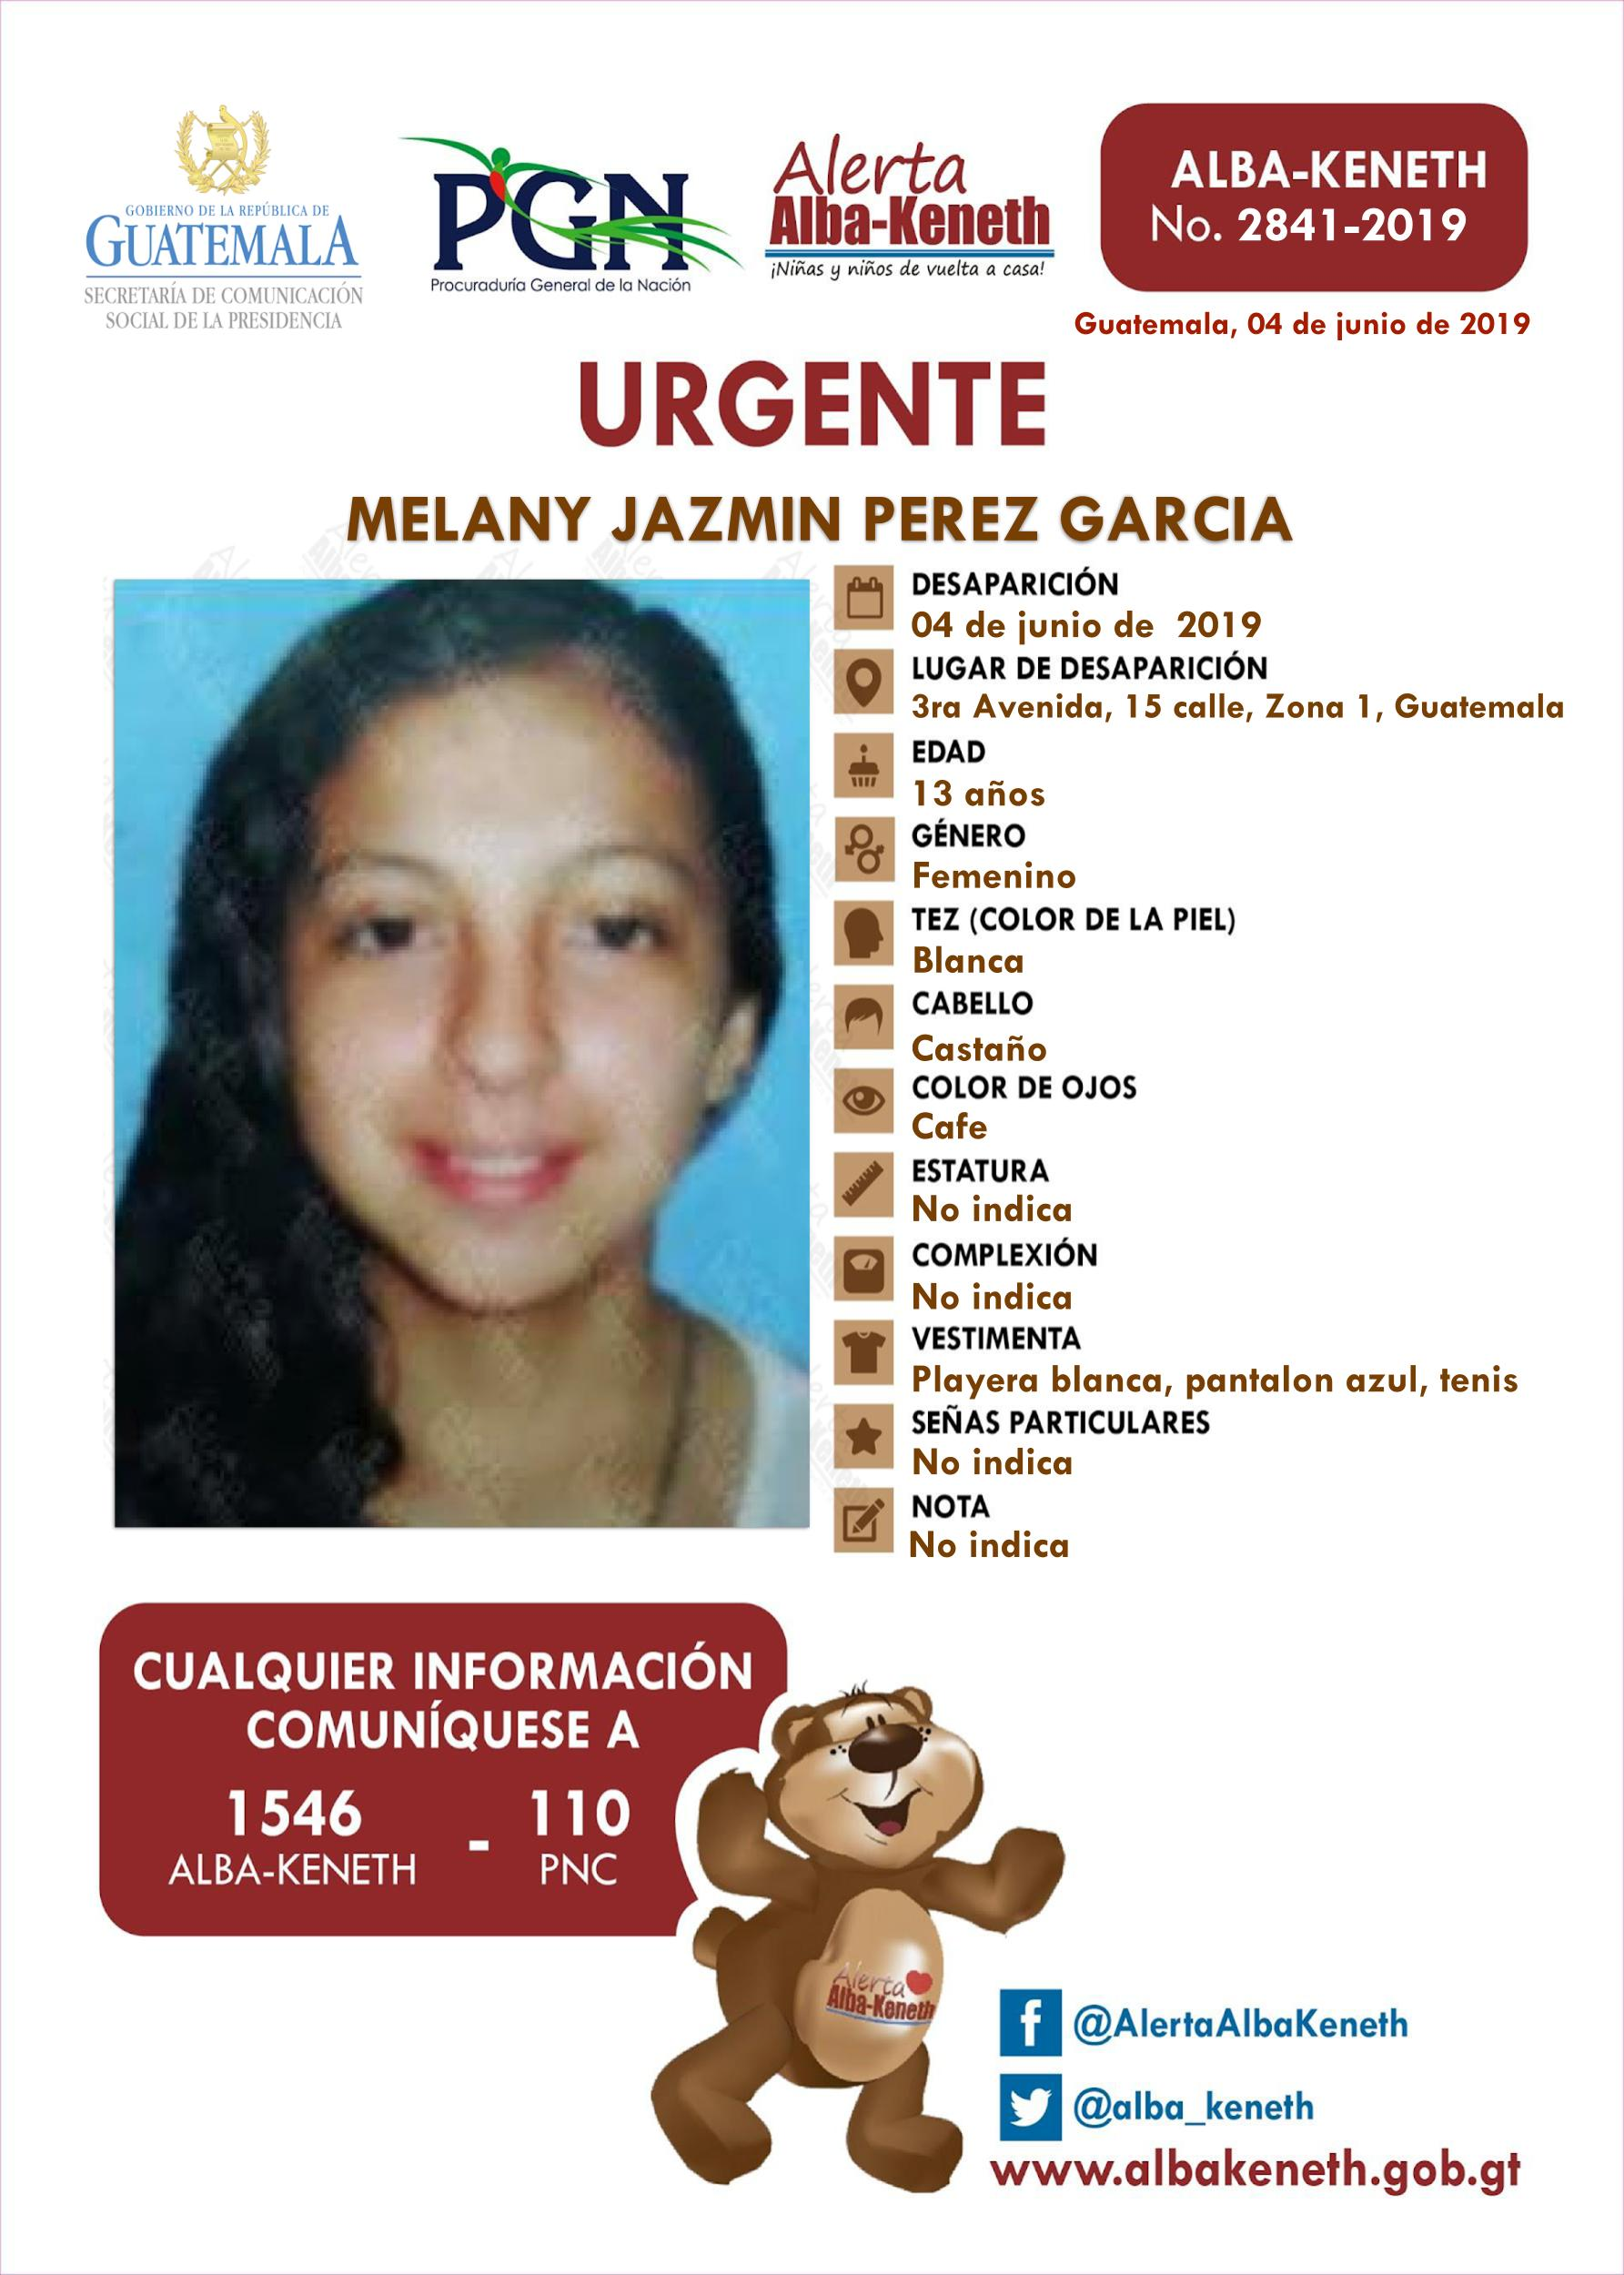 Melany Jazmin Perez Garcia